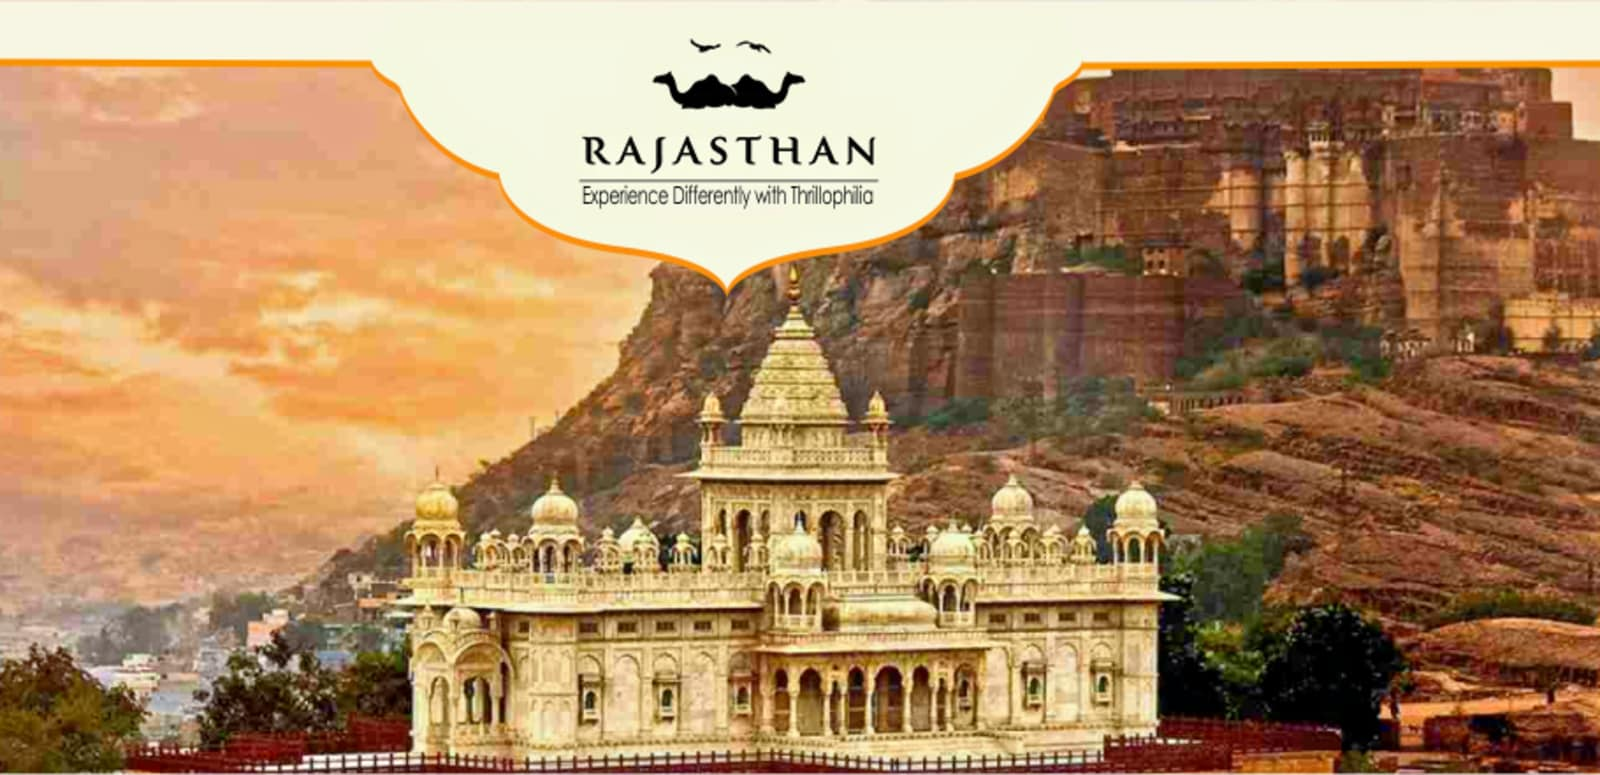 gratis dating site i rajasthan